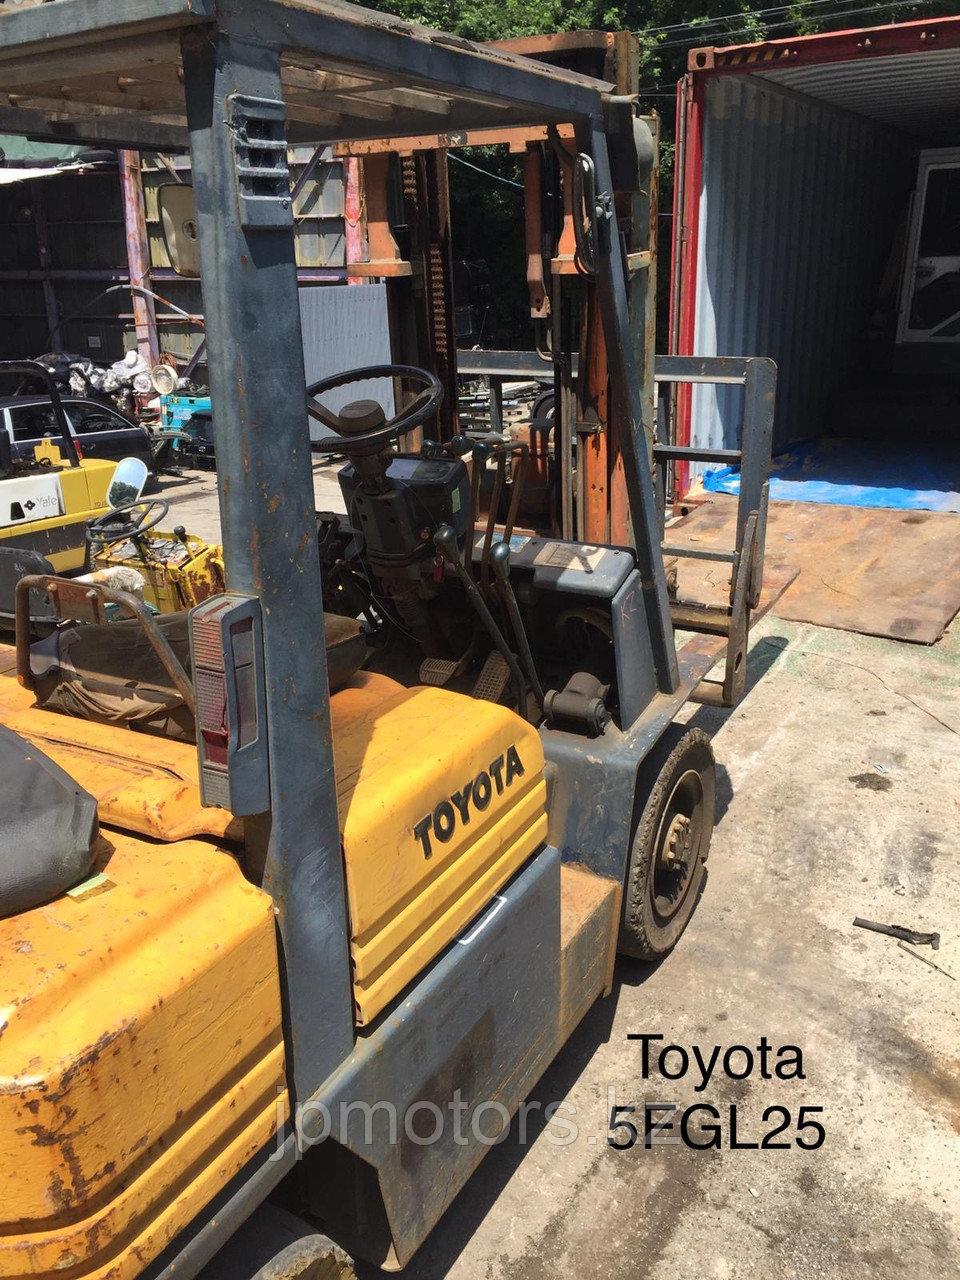 Погрузчик Toyota 5FGL 25